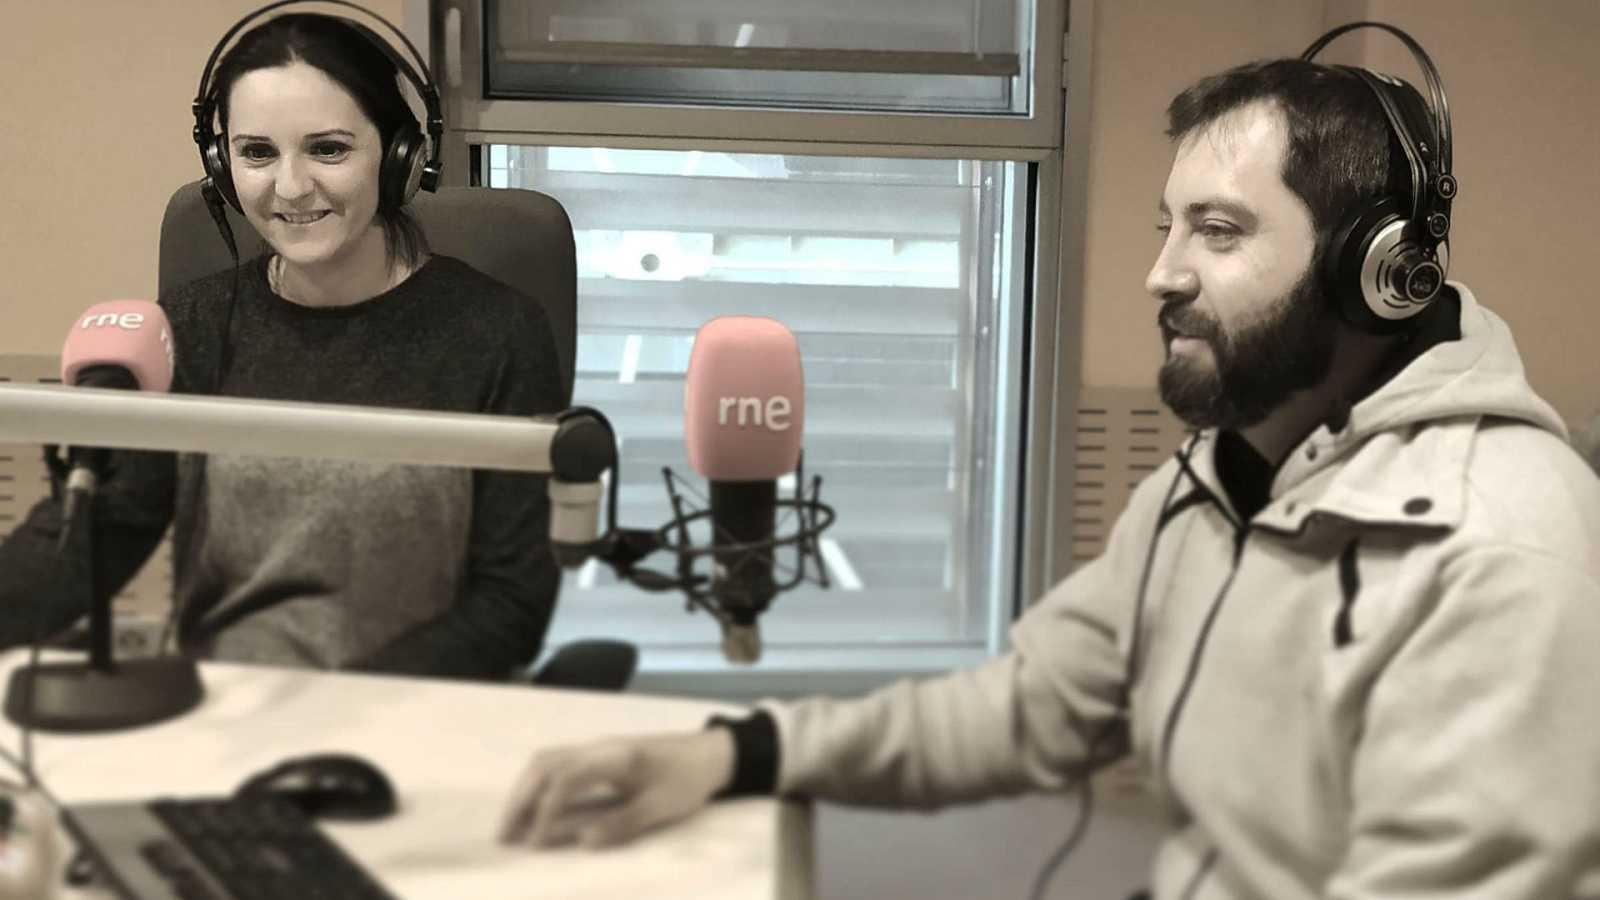 Mi gramo de locura - Alain Martorell (ACFAMES) - 02/10/20 - Escuchar ahora